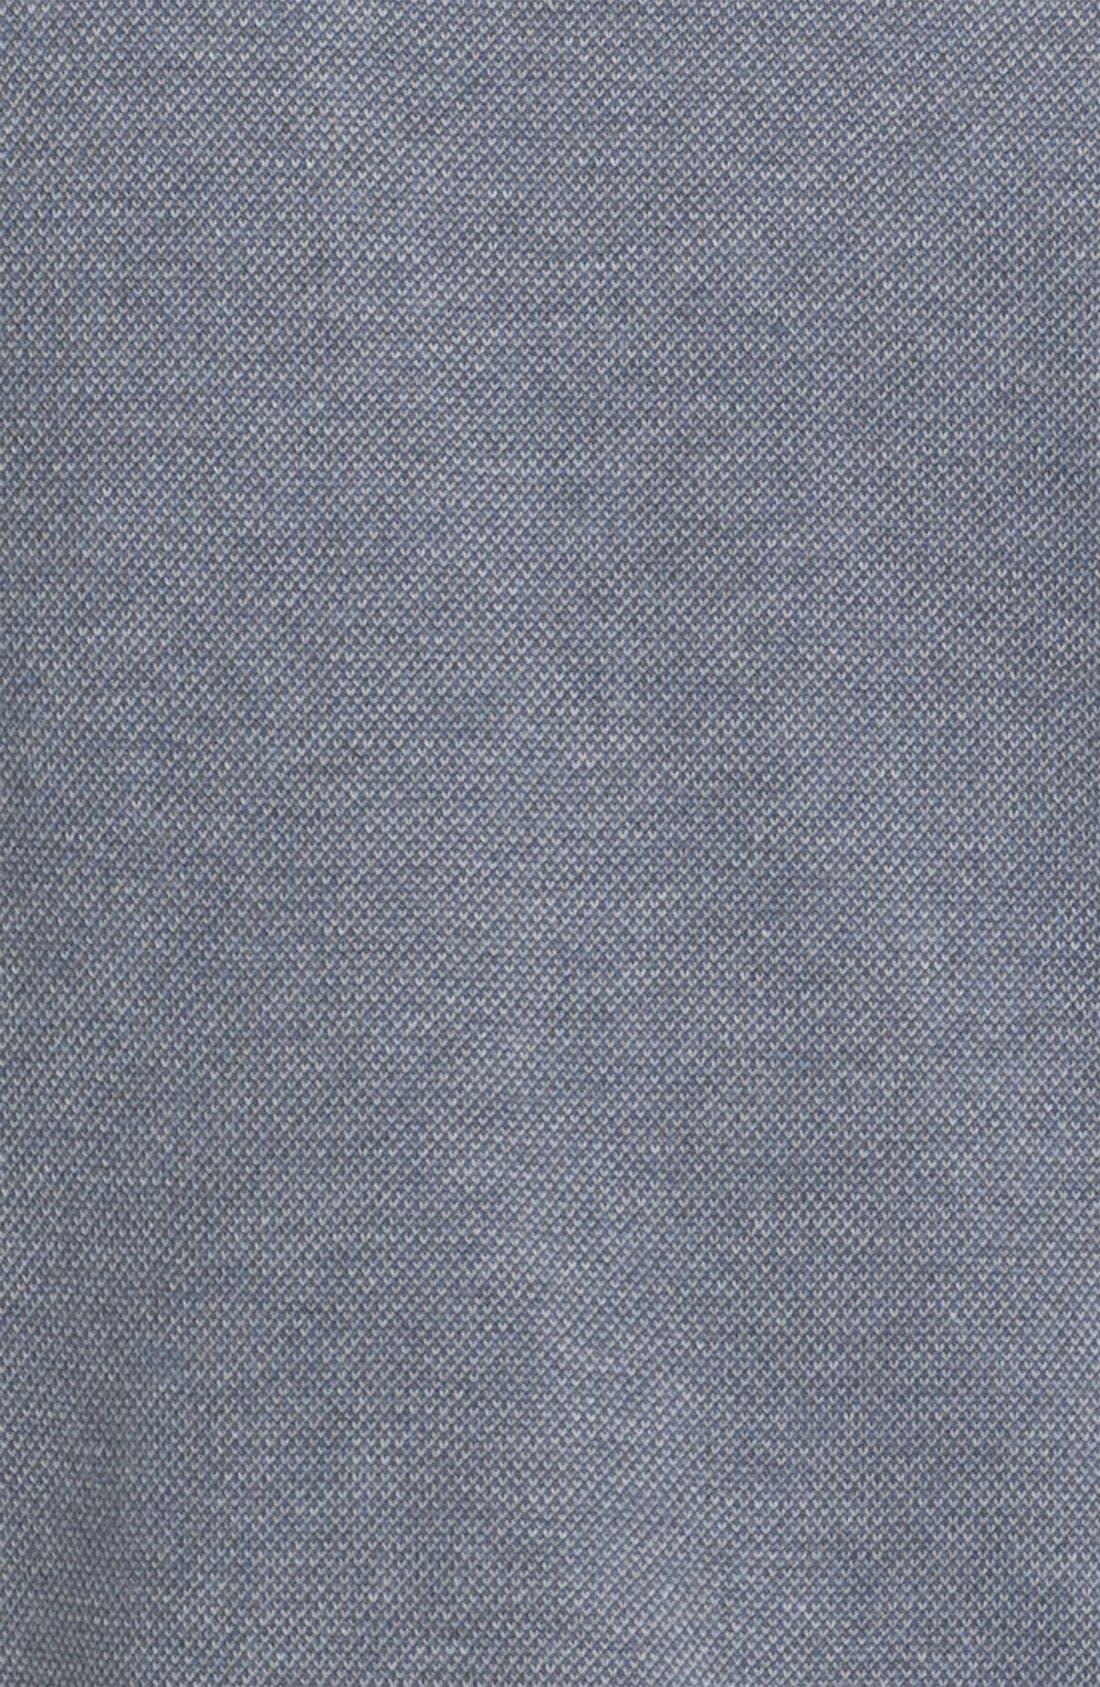 Alternate Image 3  - Vince Cotton & Cashmere Sweater